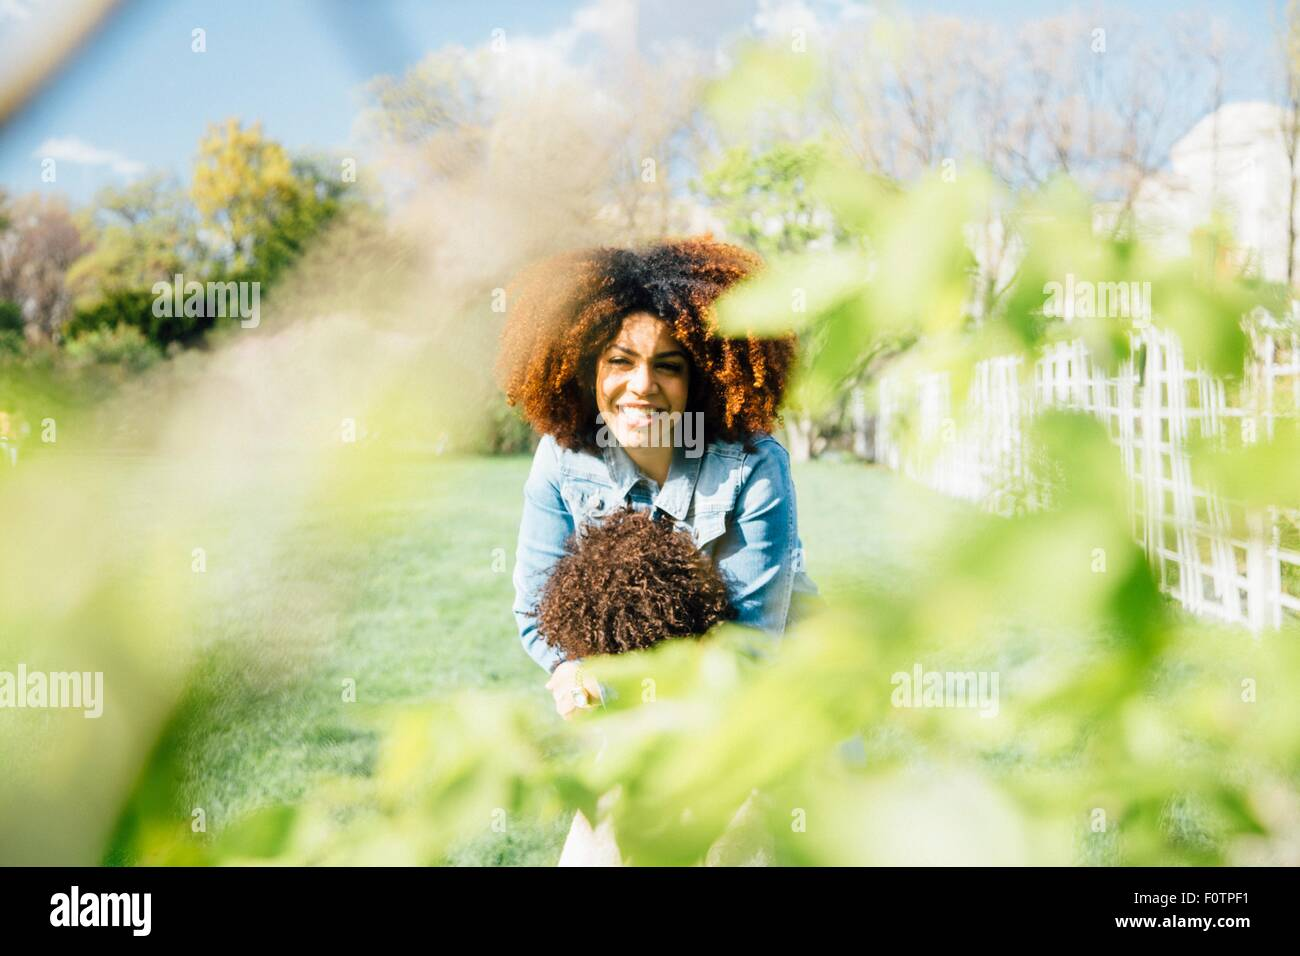 Vista a través del follaje de la madre hija abrazan sonrientes Foto de stock